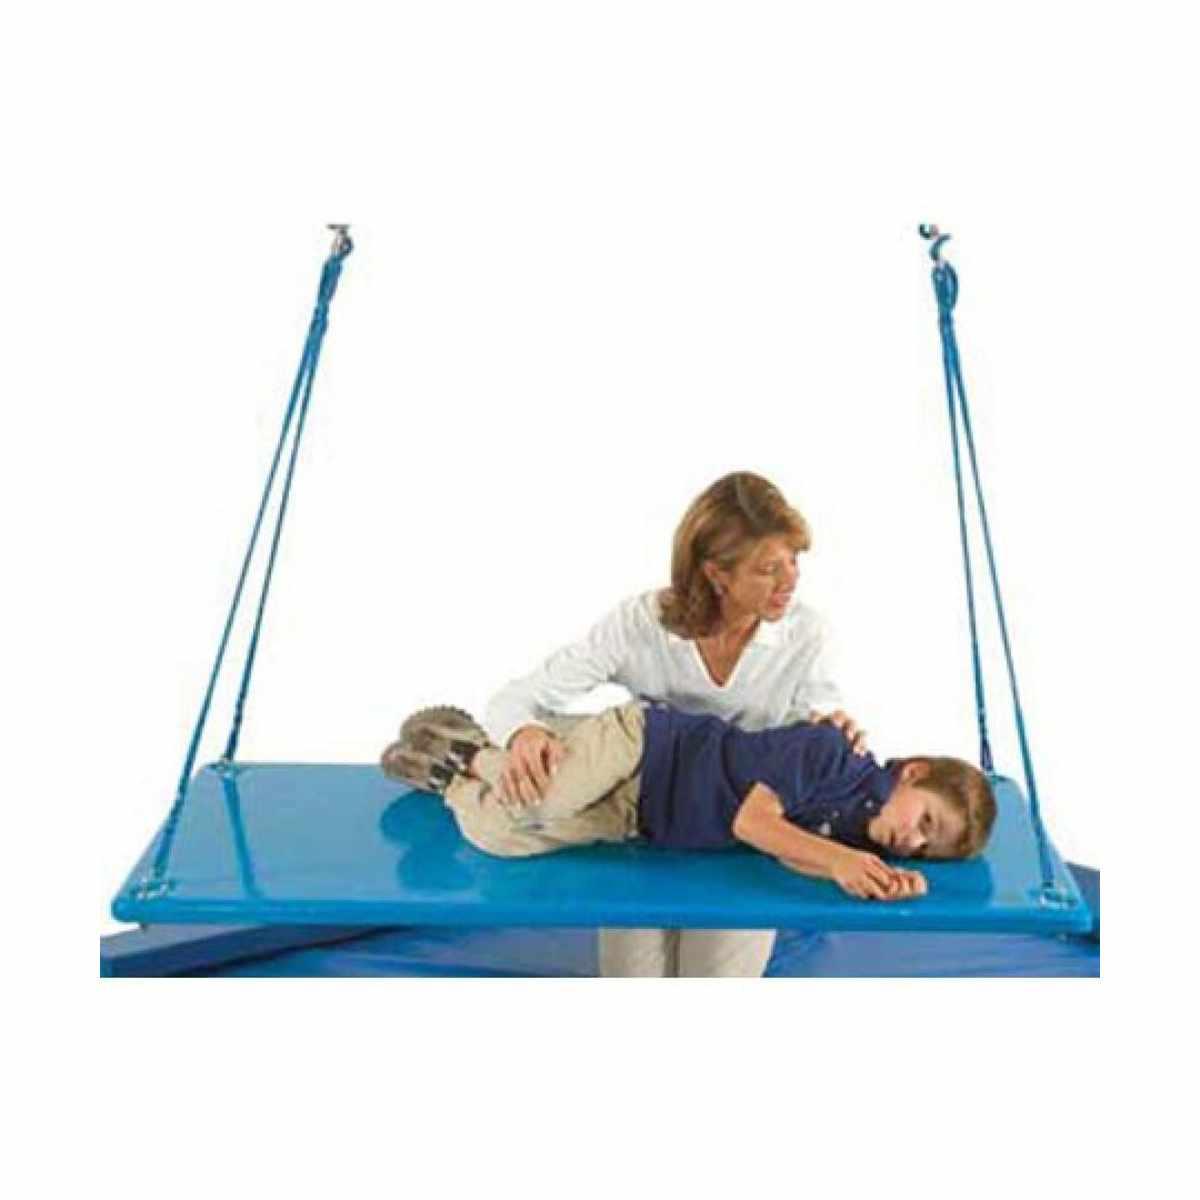 Tumble Forms Platform Swing For Vestibulator System